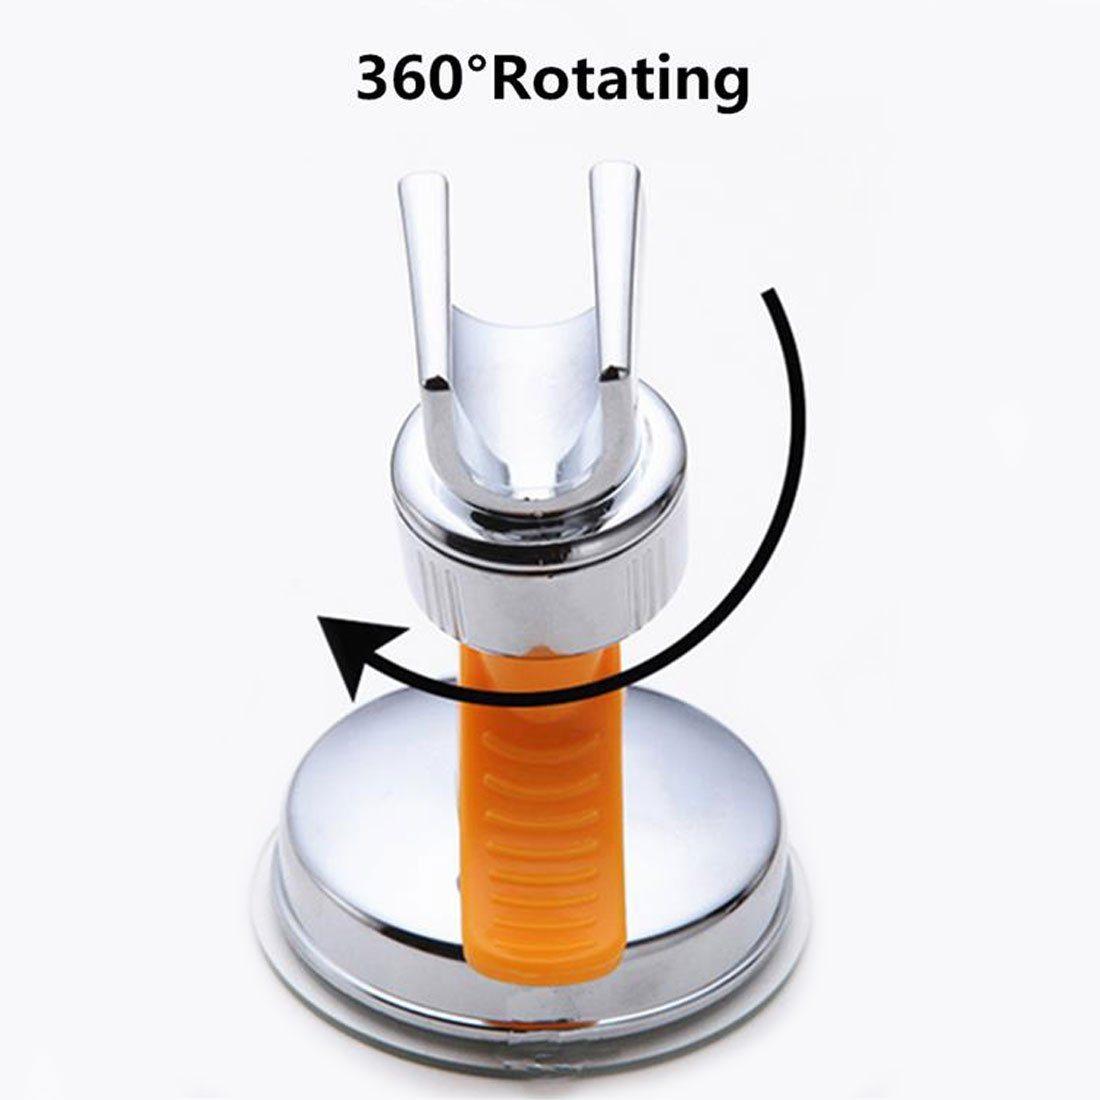 Hot Item Drill Free Vacuum Suction Cup Handheld Shower Head Holder Bracket